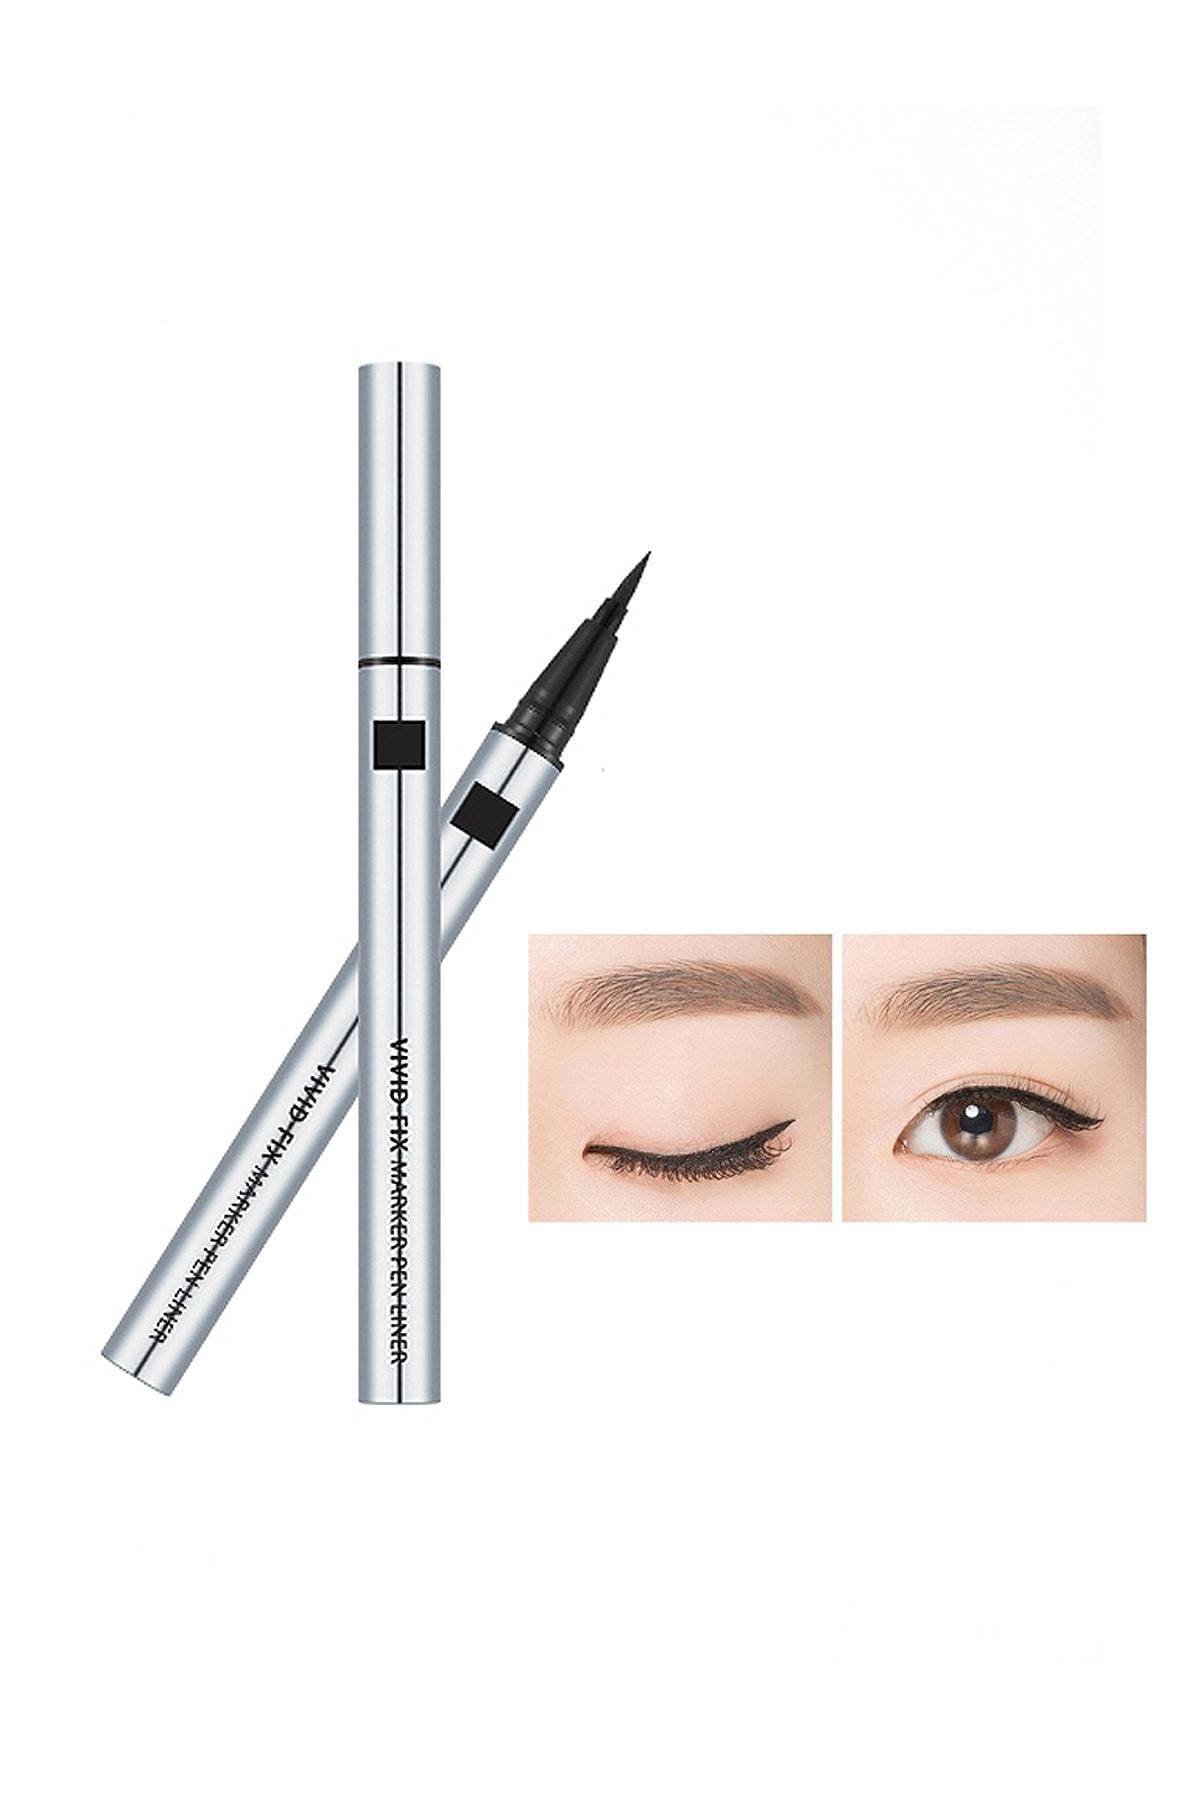 Missha Kalıcı & Kadife Uçlu Eyeliner Vivid Fix Marker Pen Liner (Deep Black) 0